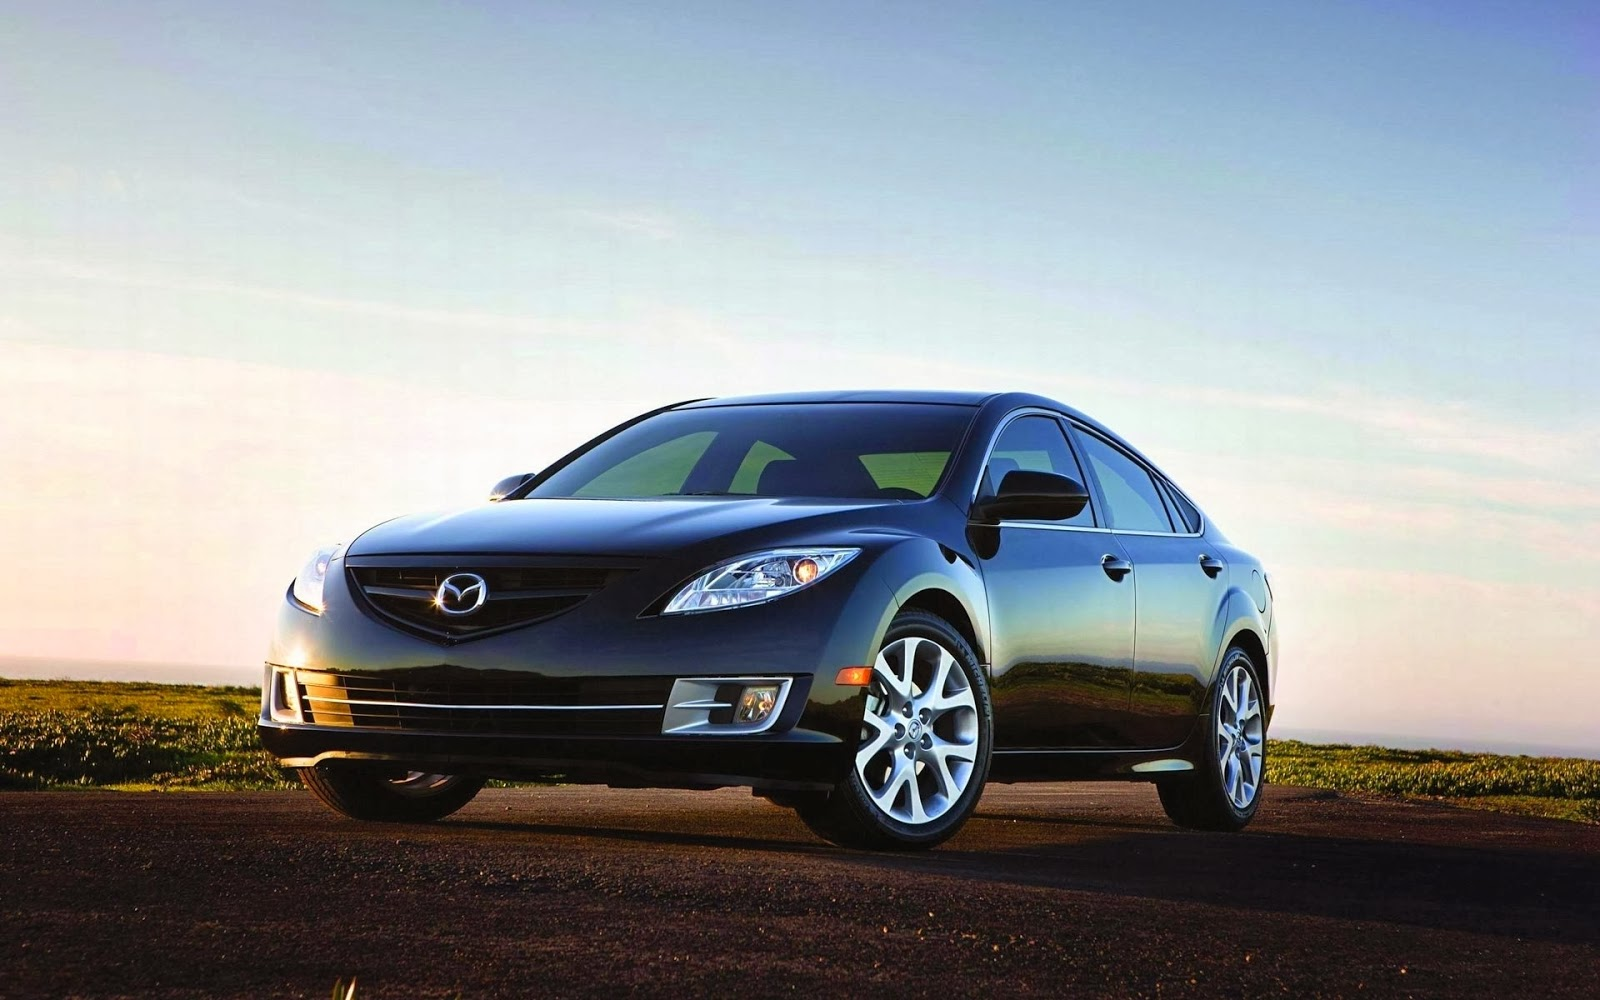 Mazda 6 HD Wallpapers 2014 - HD Wallpapers Blog